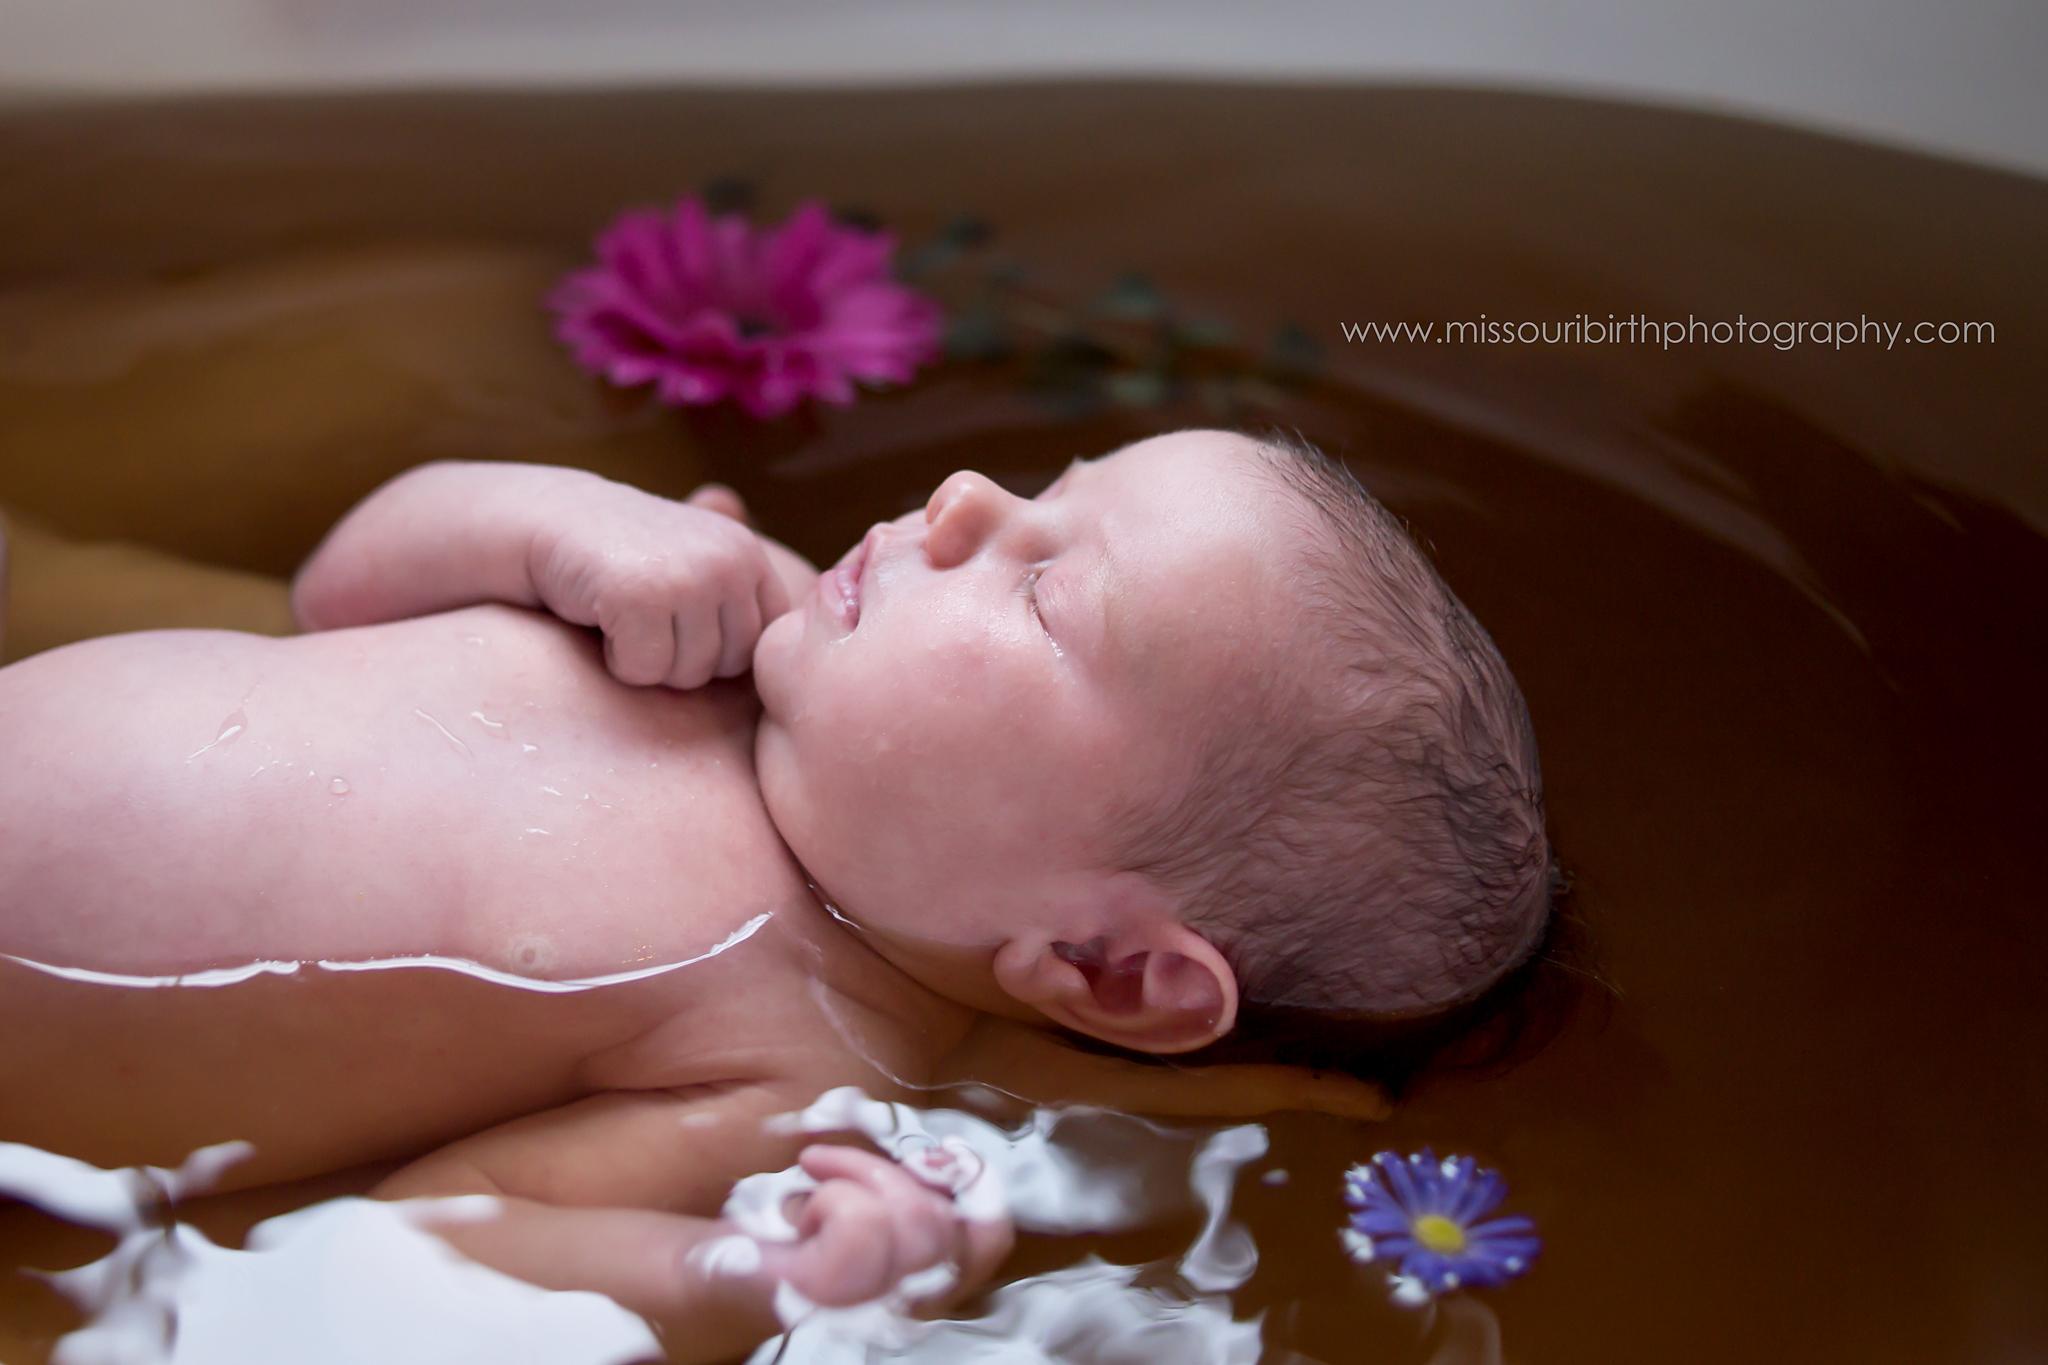 Sleeping newborn herbal bath fresh flowers